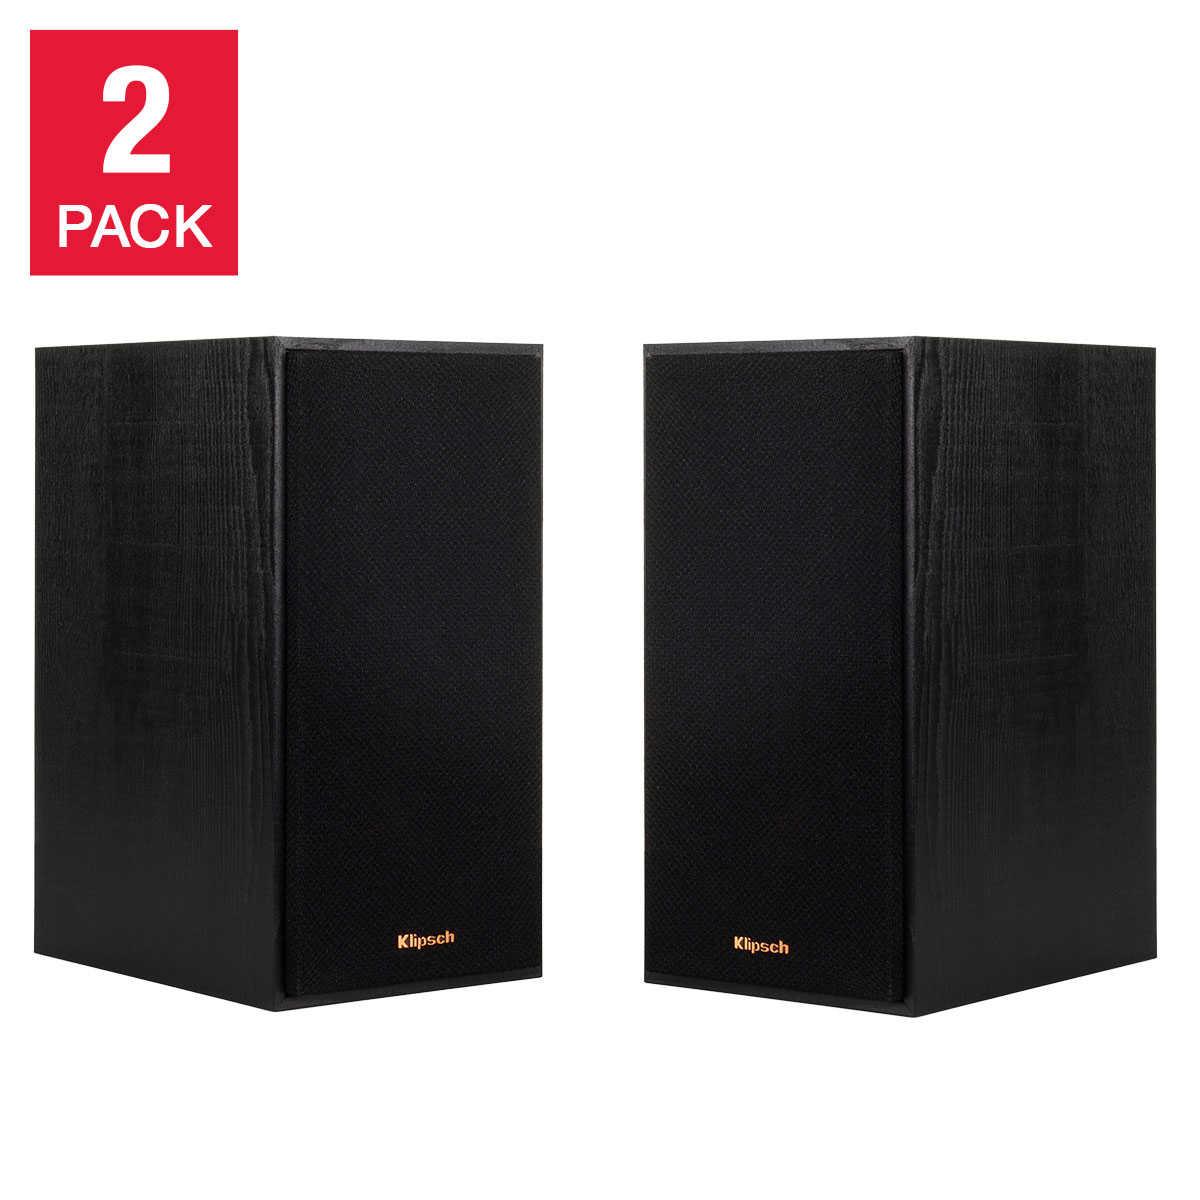 Klipsch Bookshelf Speakers R-41M (pair) $89.99